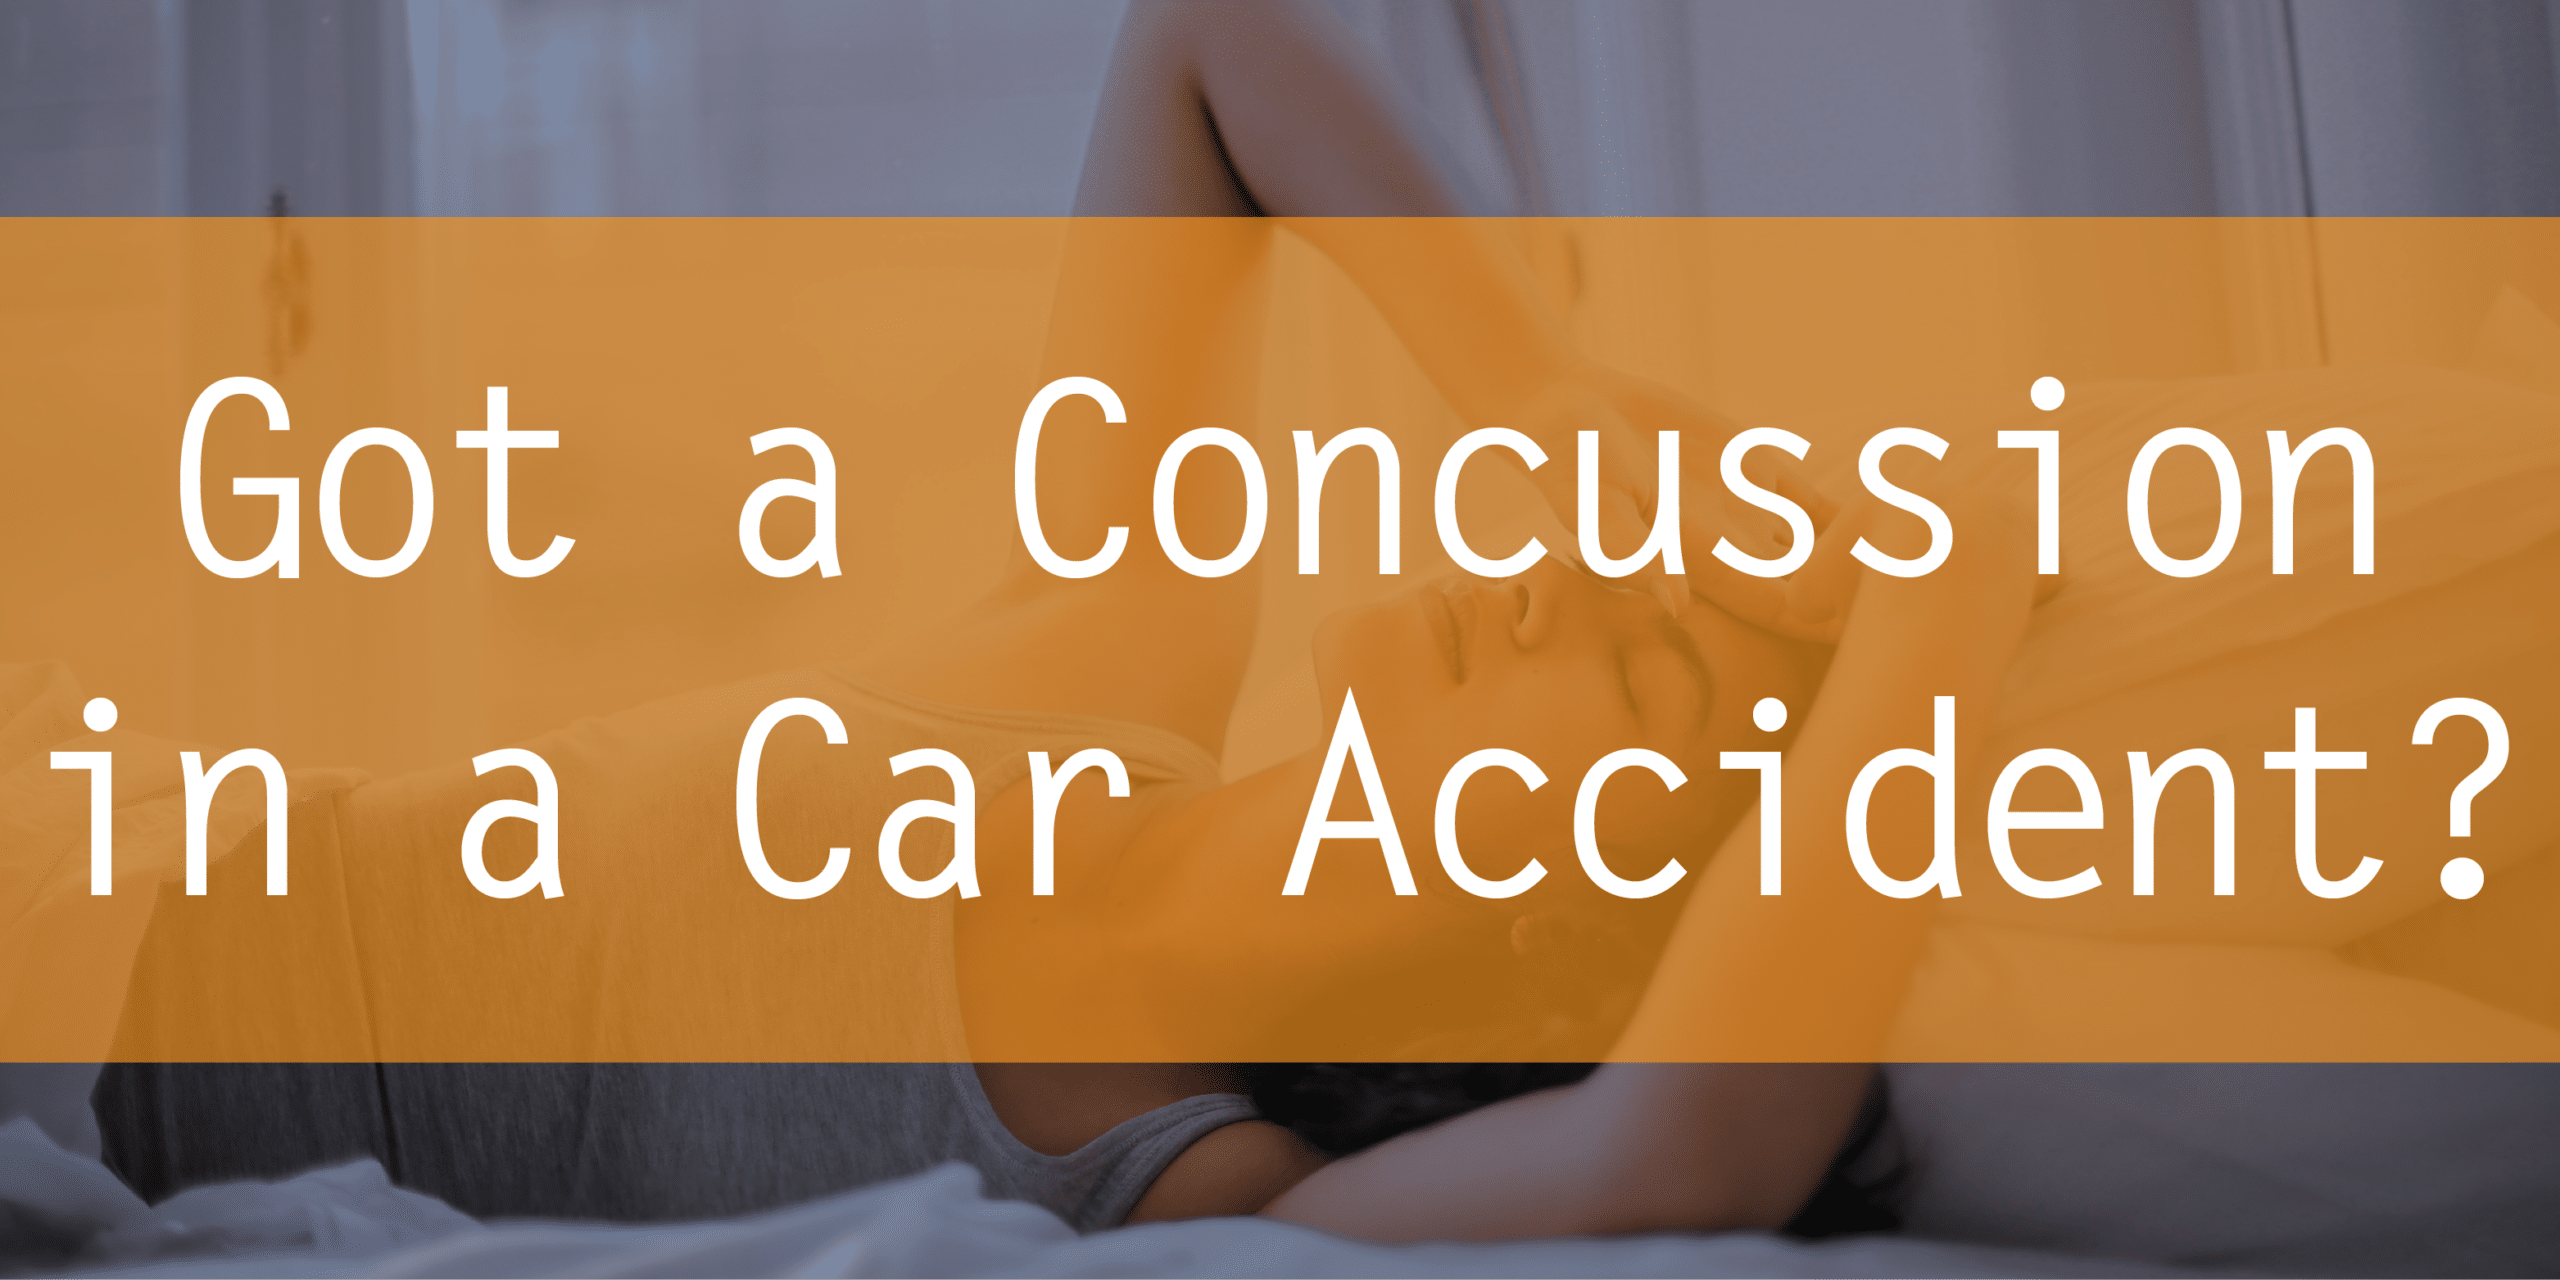 Got a concussion in a car accident?